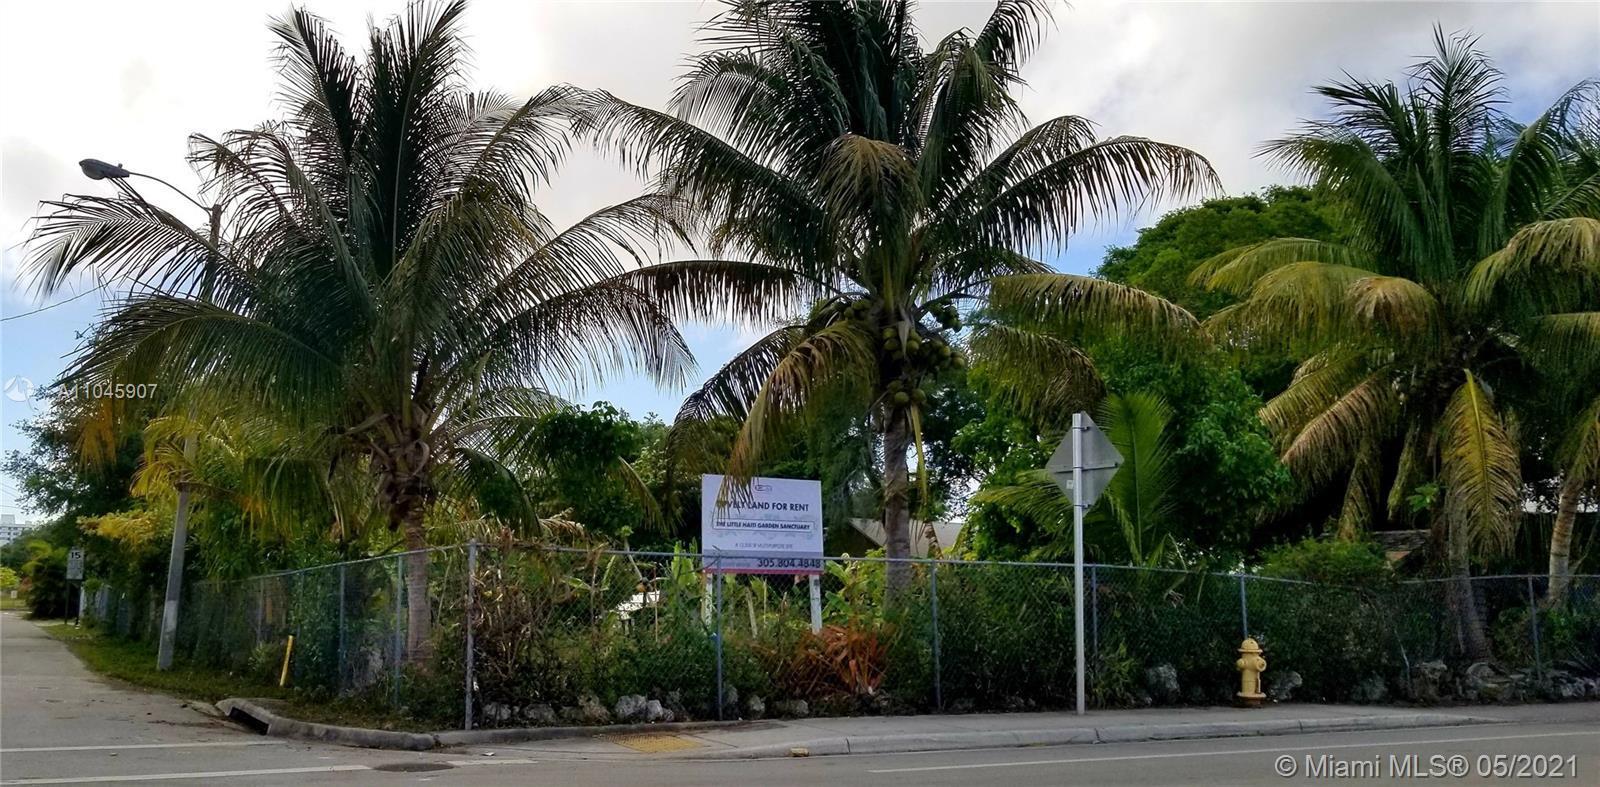 ***DEVELOPMENT SITE IN LITTLE HAITI***Located at the corner of NE 2 Ave & NE 58 St between $1B Magic